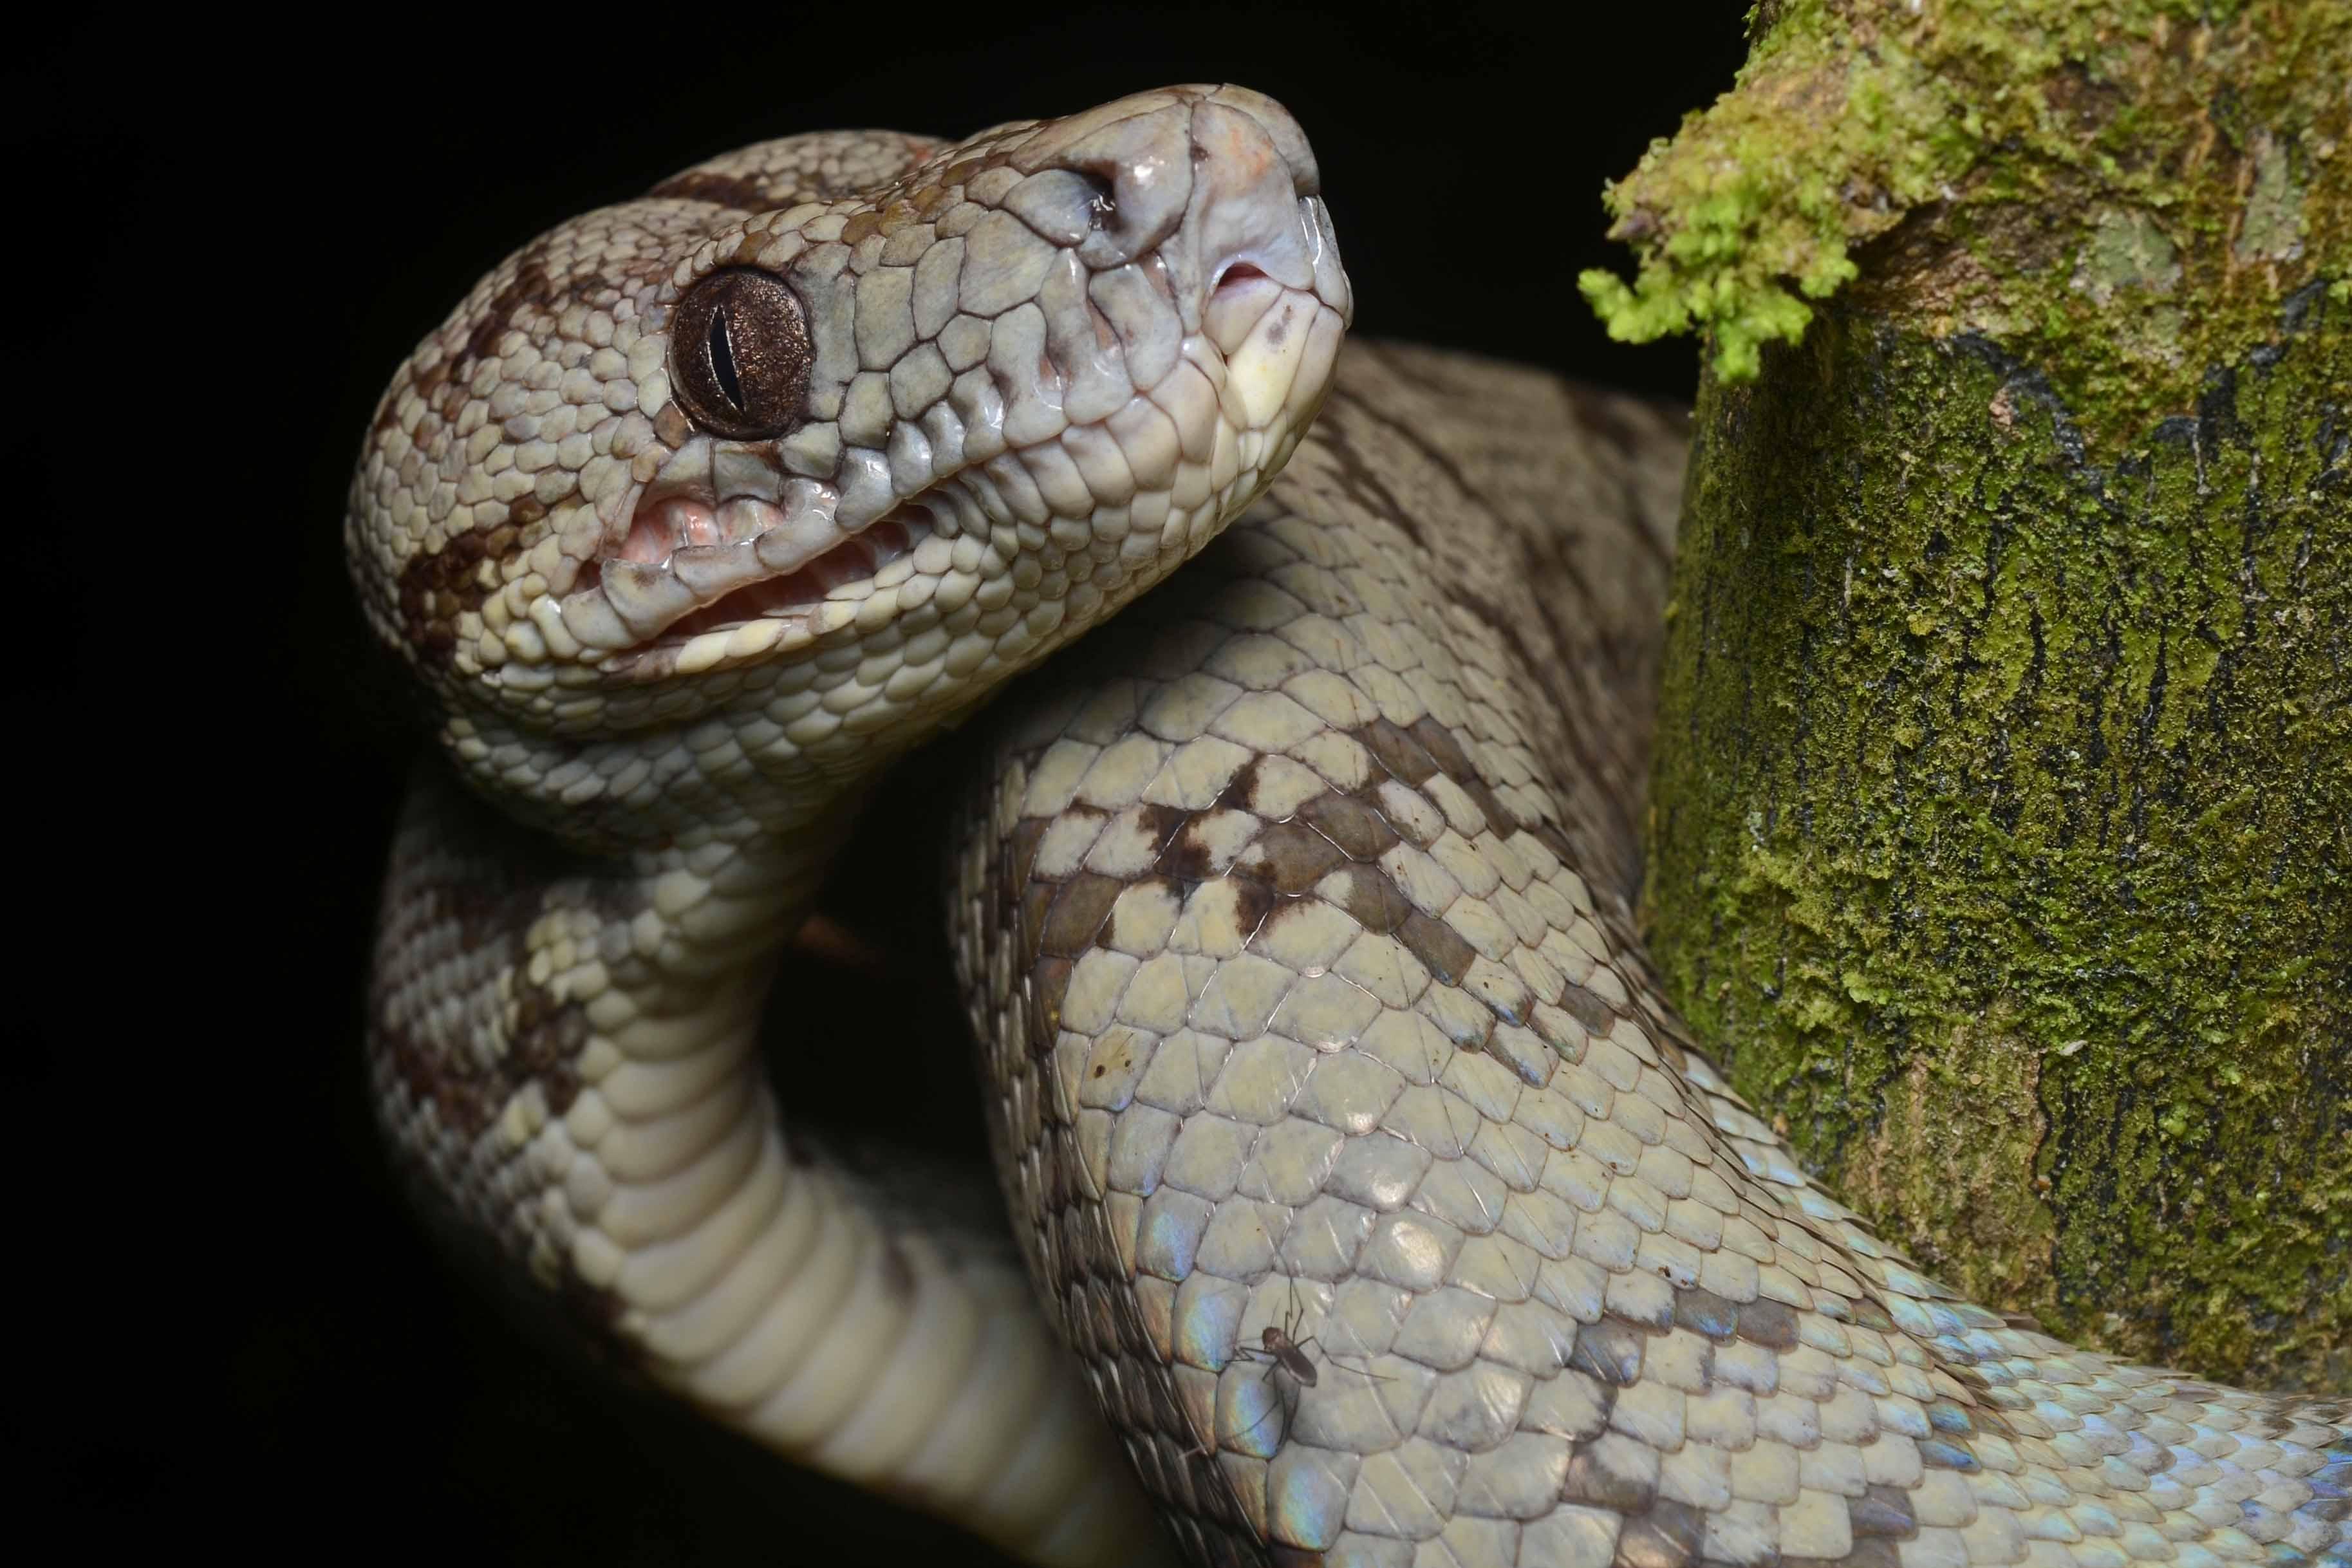 Wholesale Reptiles for Sale  Wholesale Reptiles for Sale